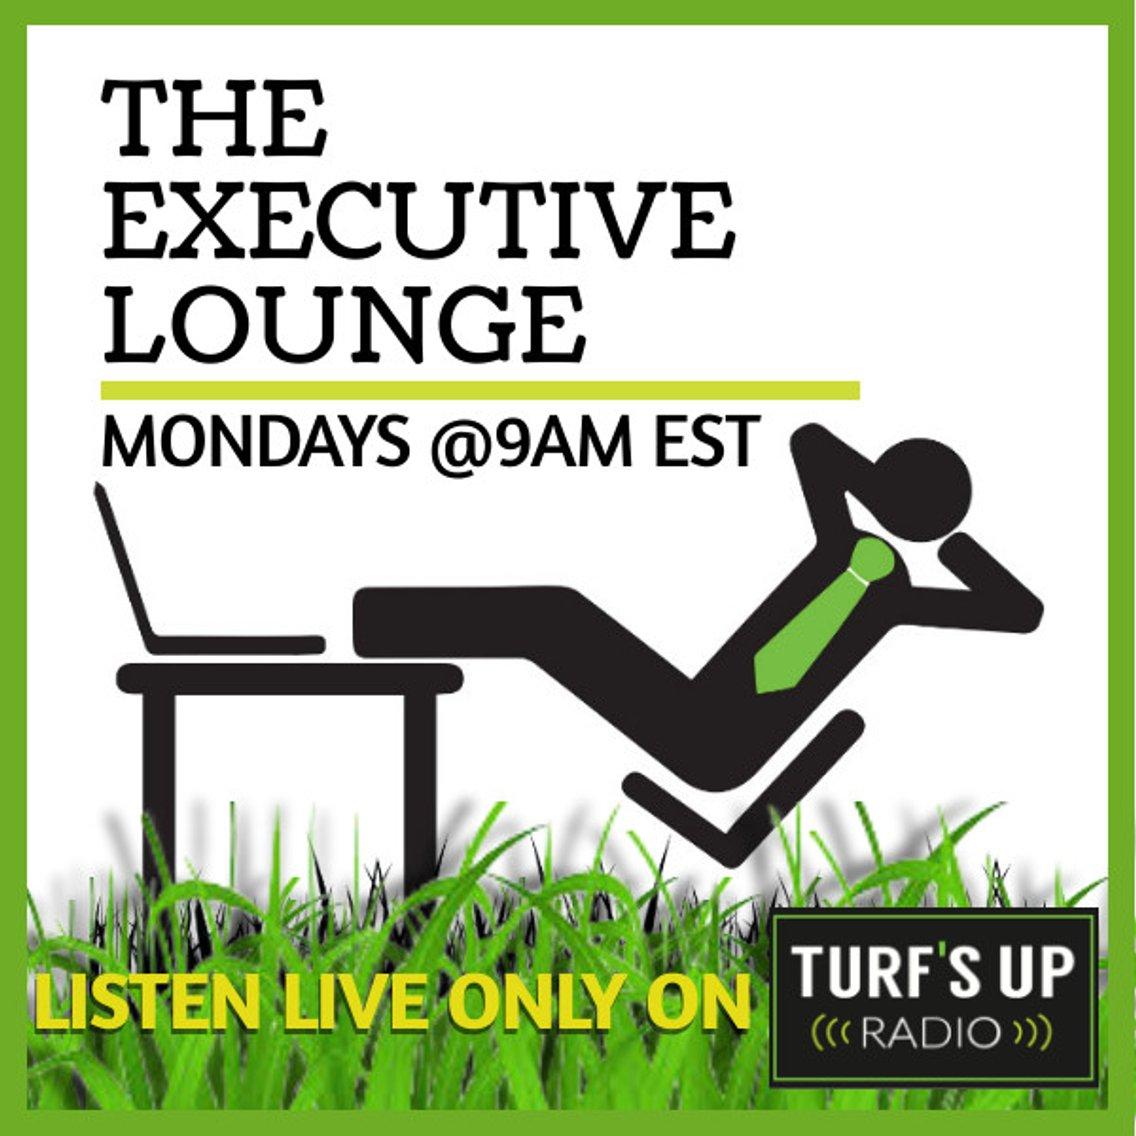 Executive Lounge | Turf's Up Radio - Cover Image